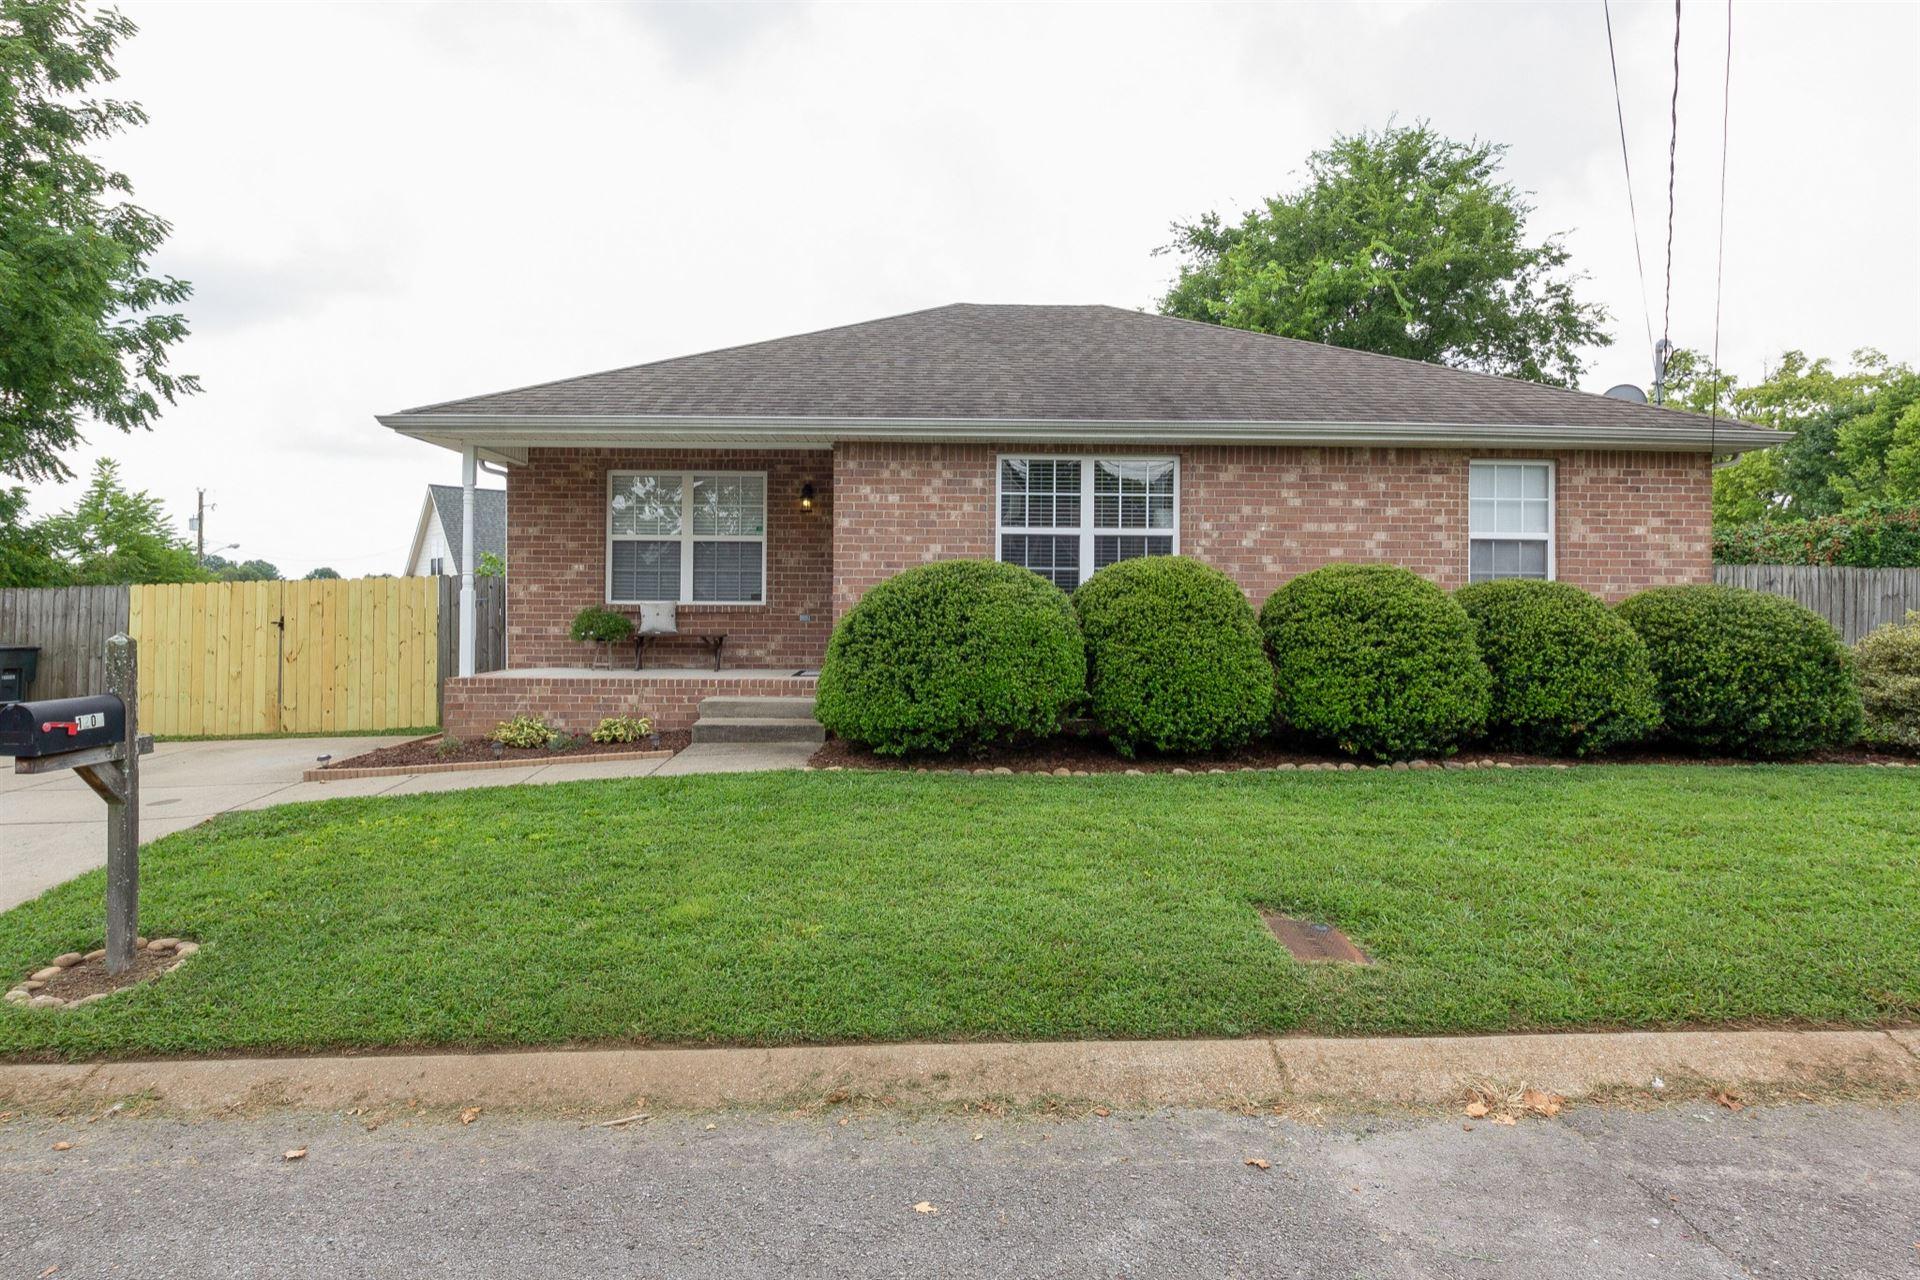 1205 Westridge Ct, Antioch, TN 37013 - MLS#: 2175610